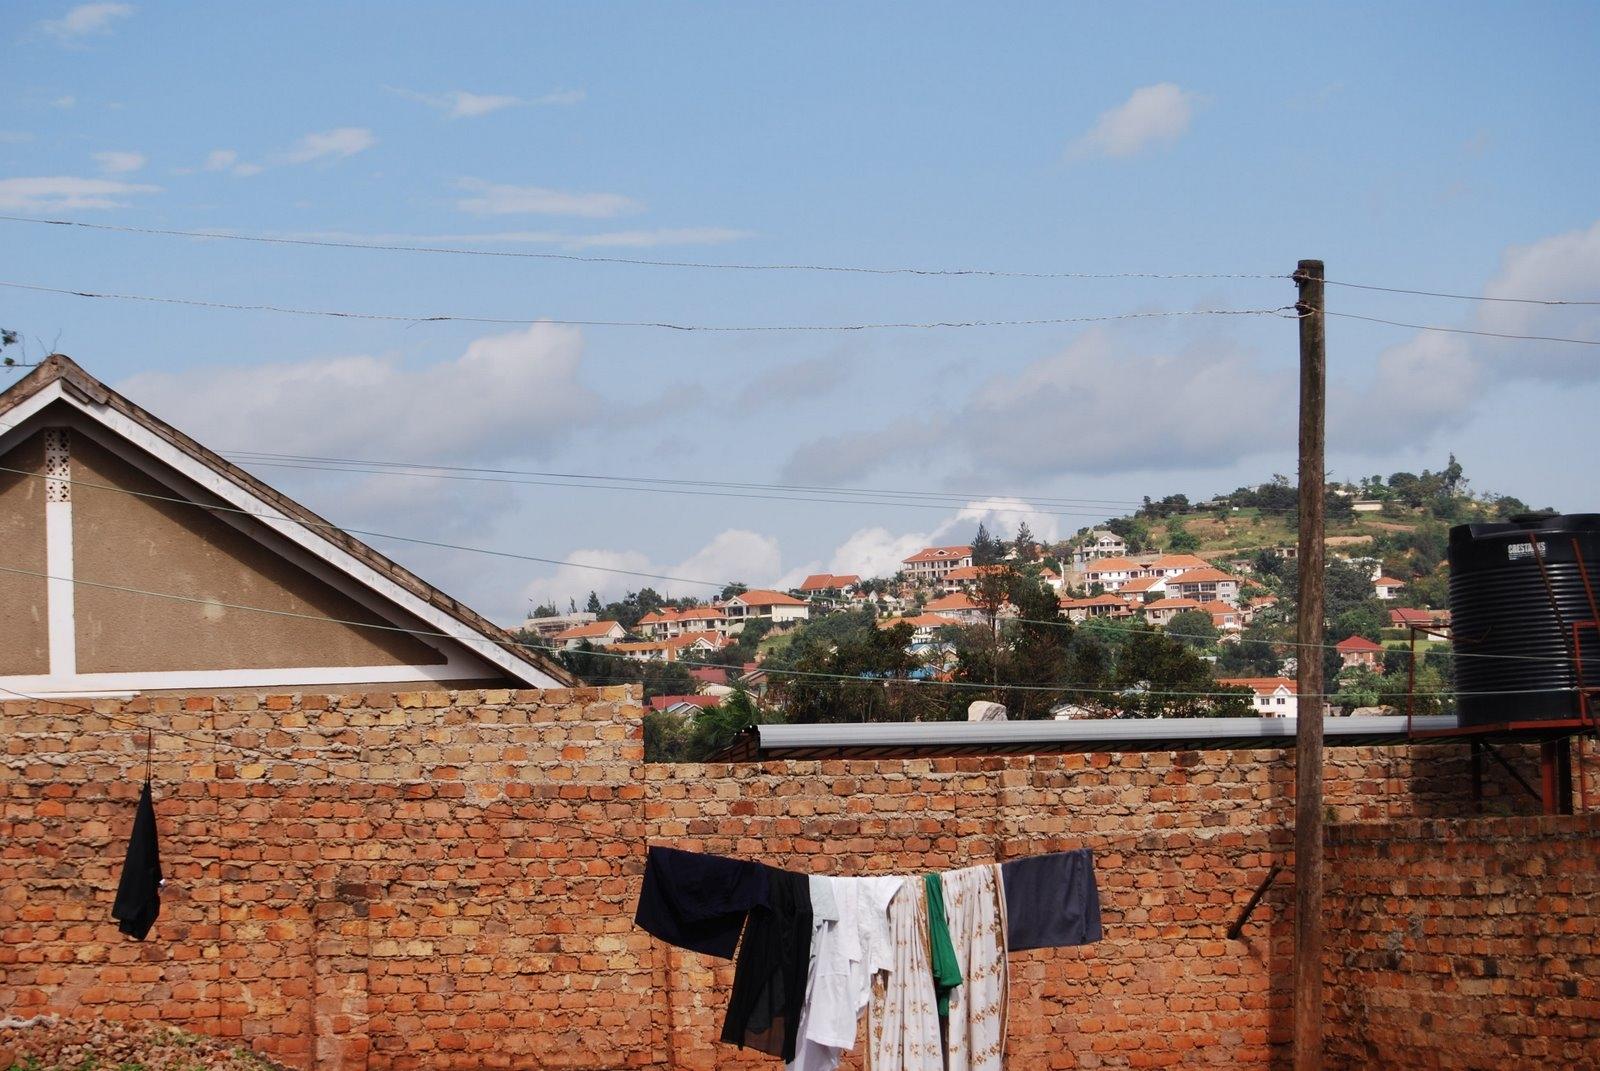 better housing beyond the perimeter wall